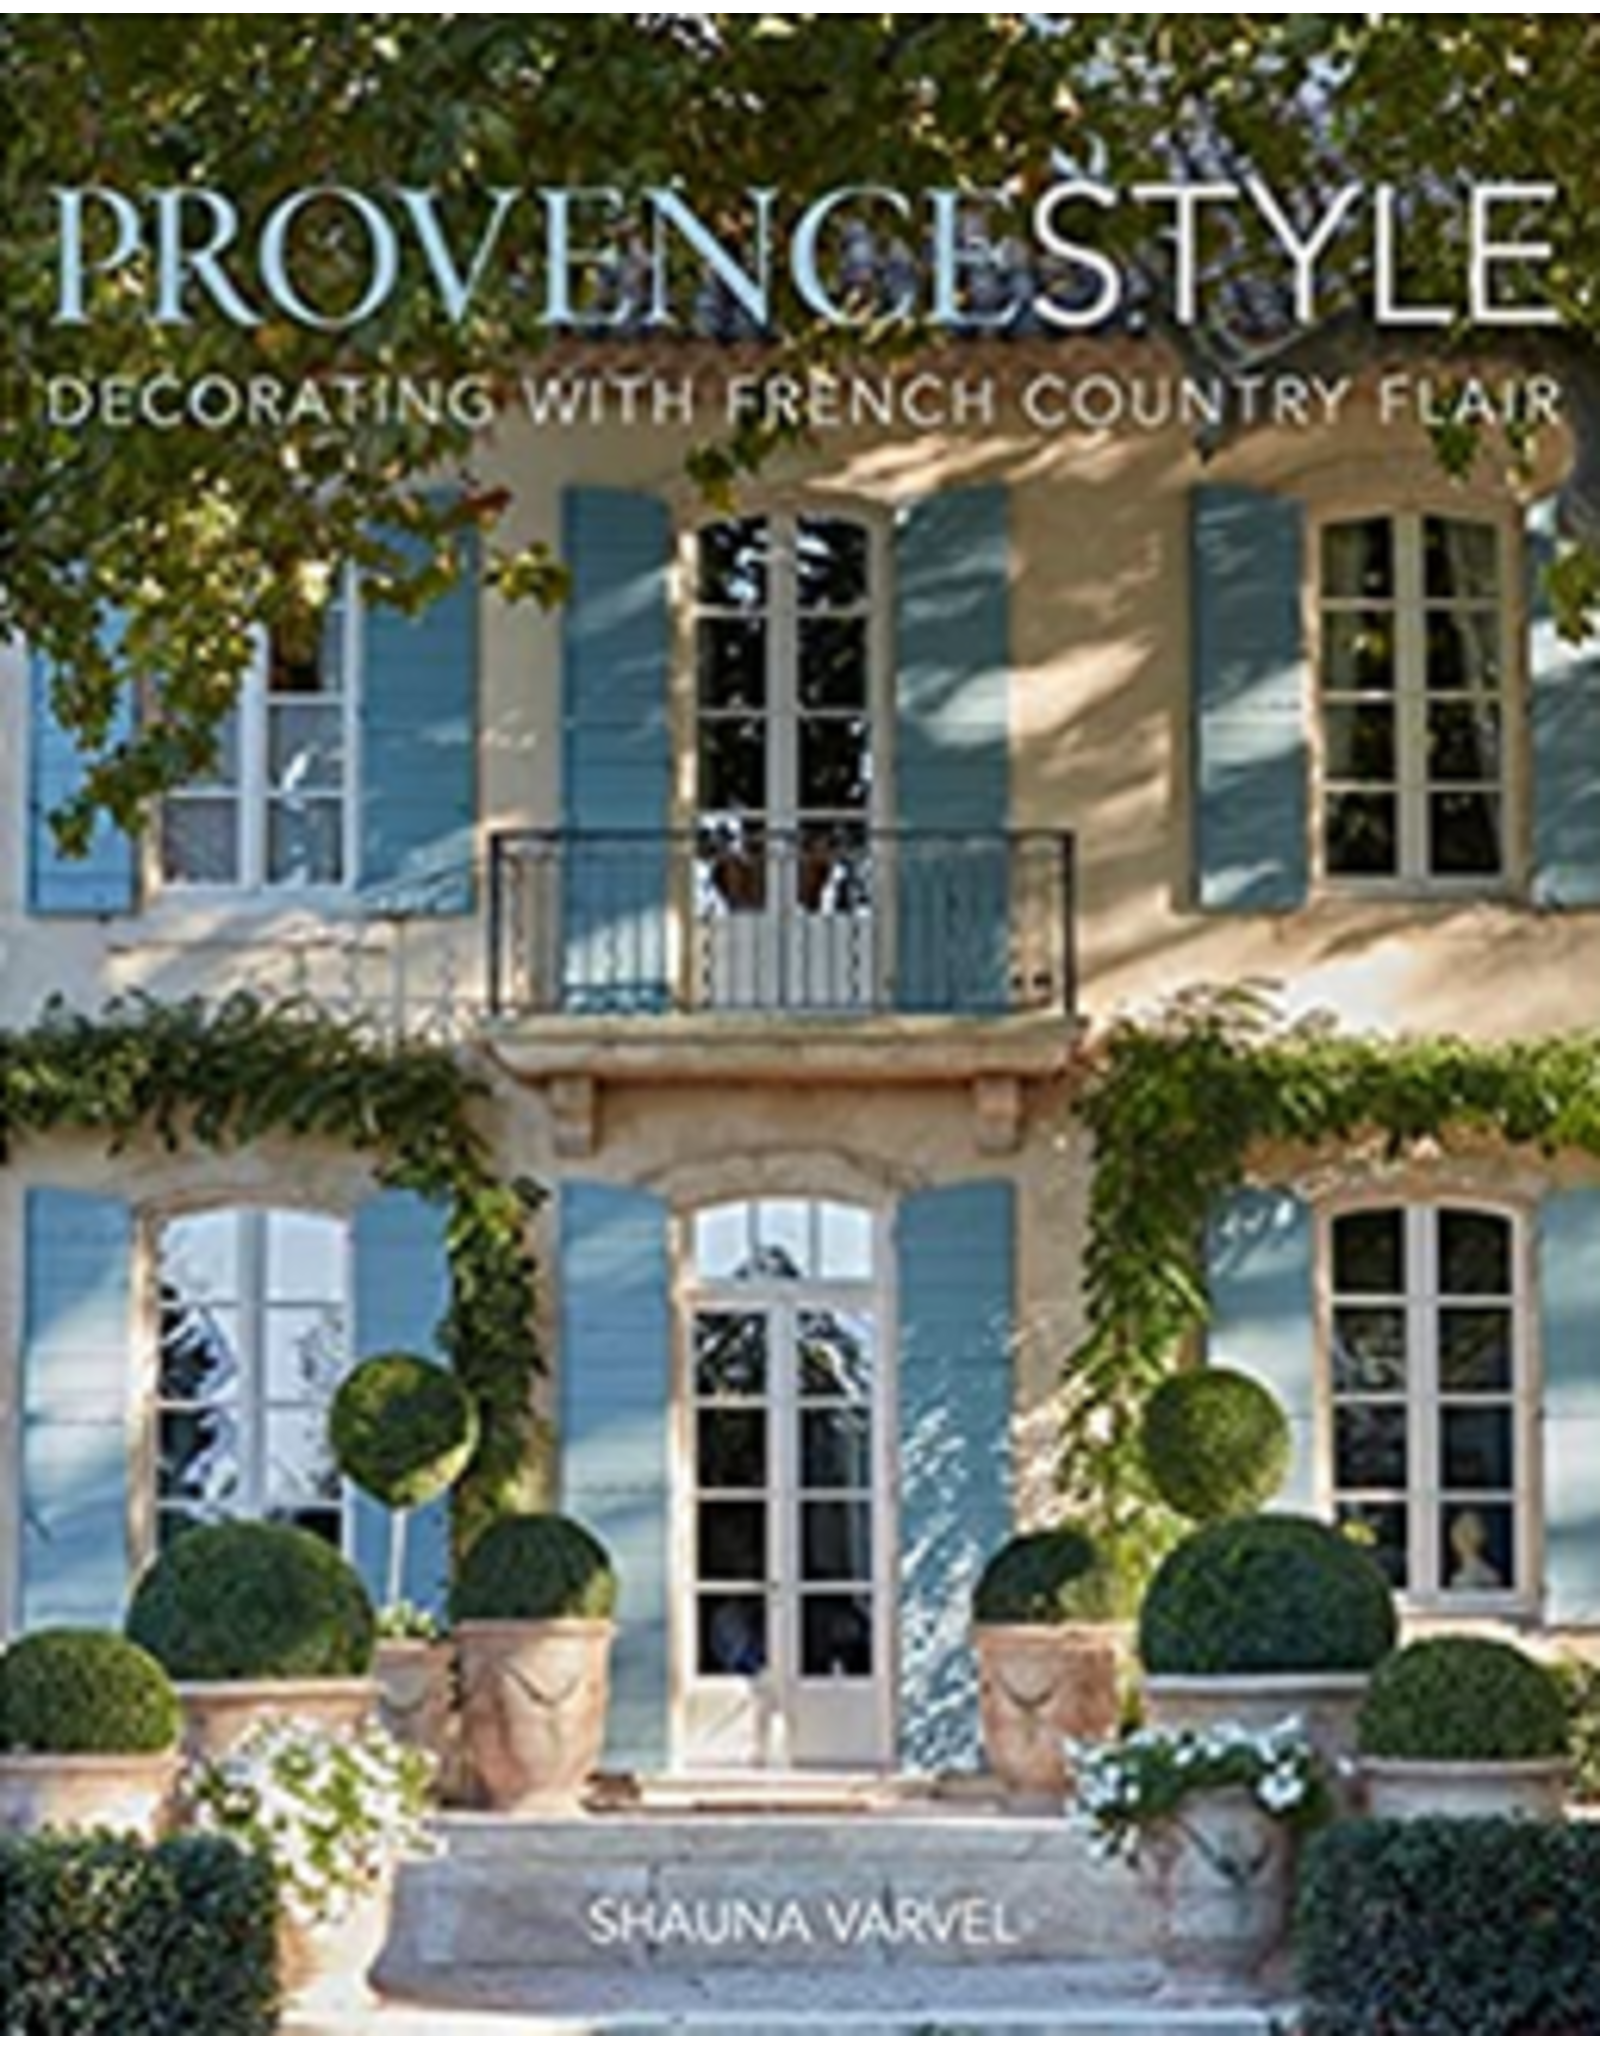 Hachette Provence Style